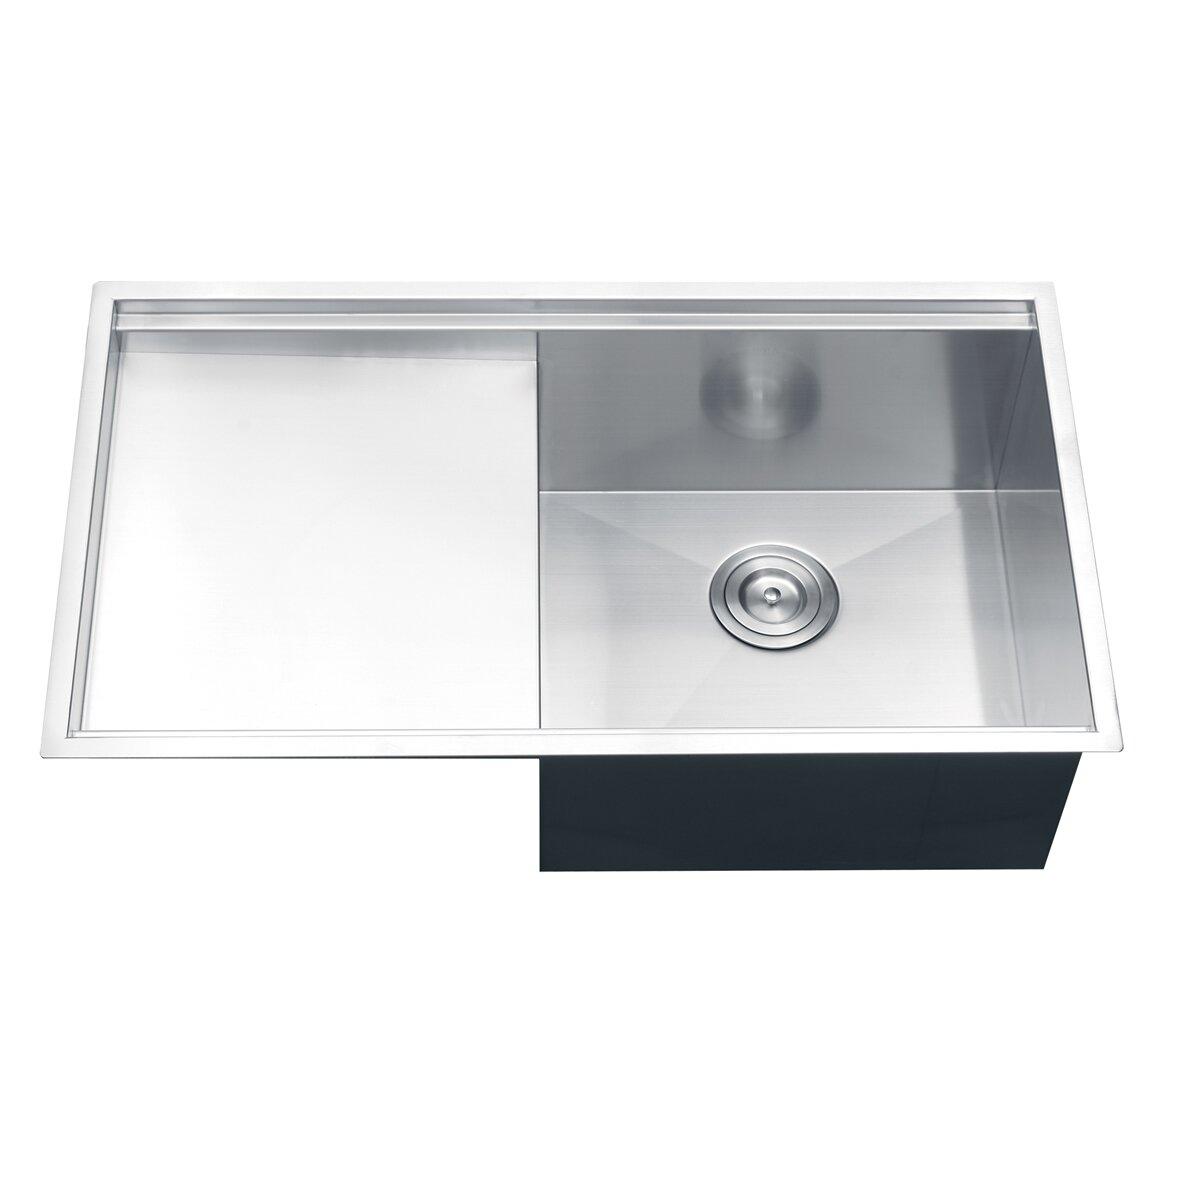 Ruvati Roma 33 X 19 Undermount Single Bowl Kitchen Sink Reviews Wayfair